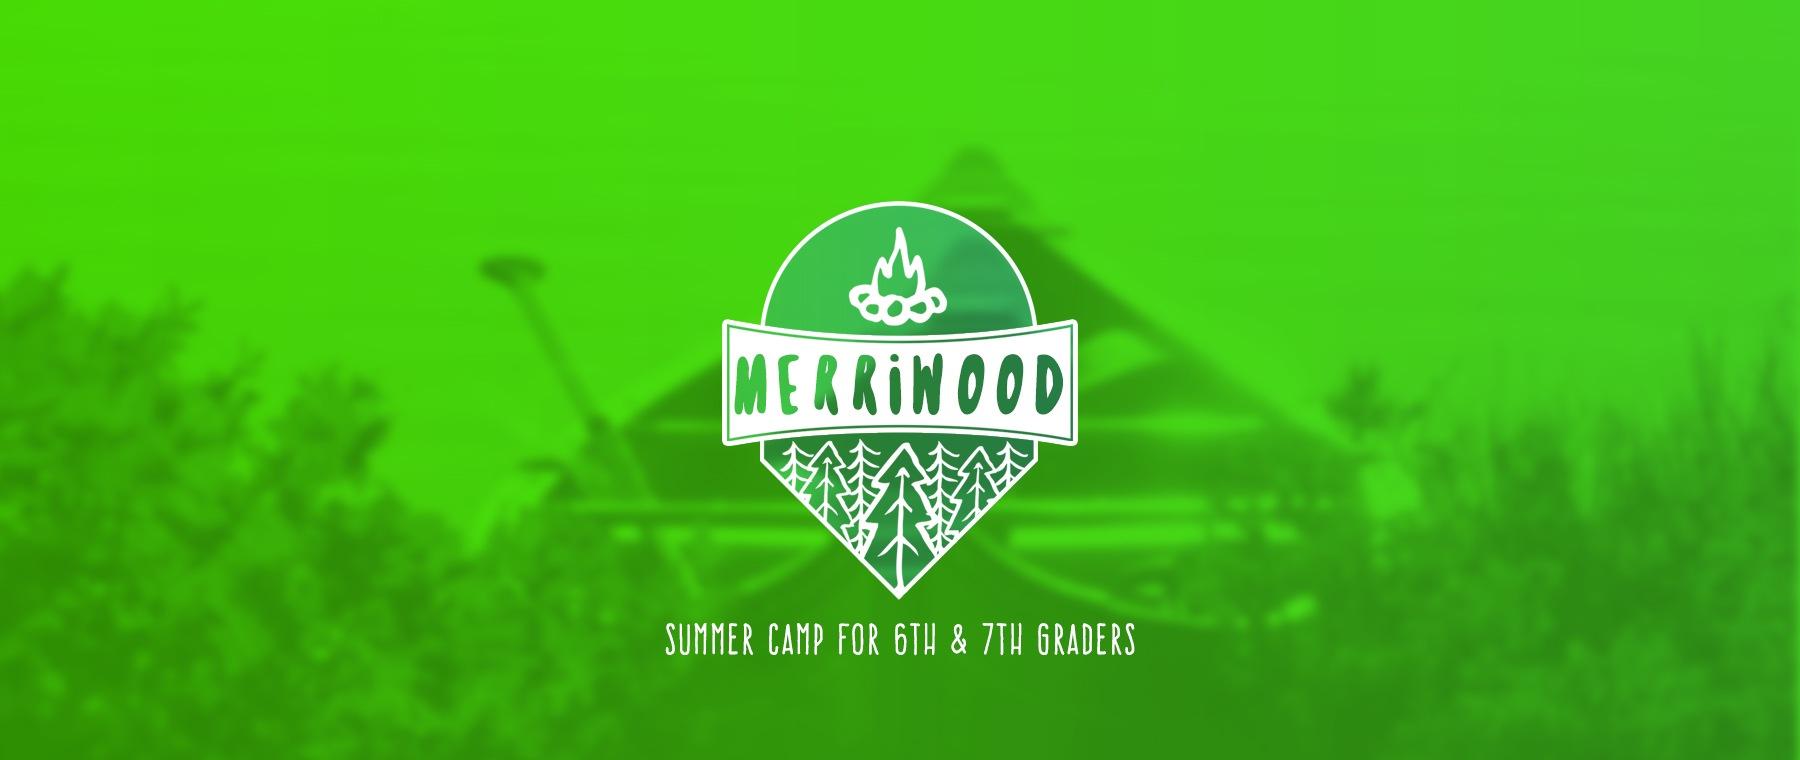 Merriwood 18